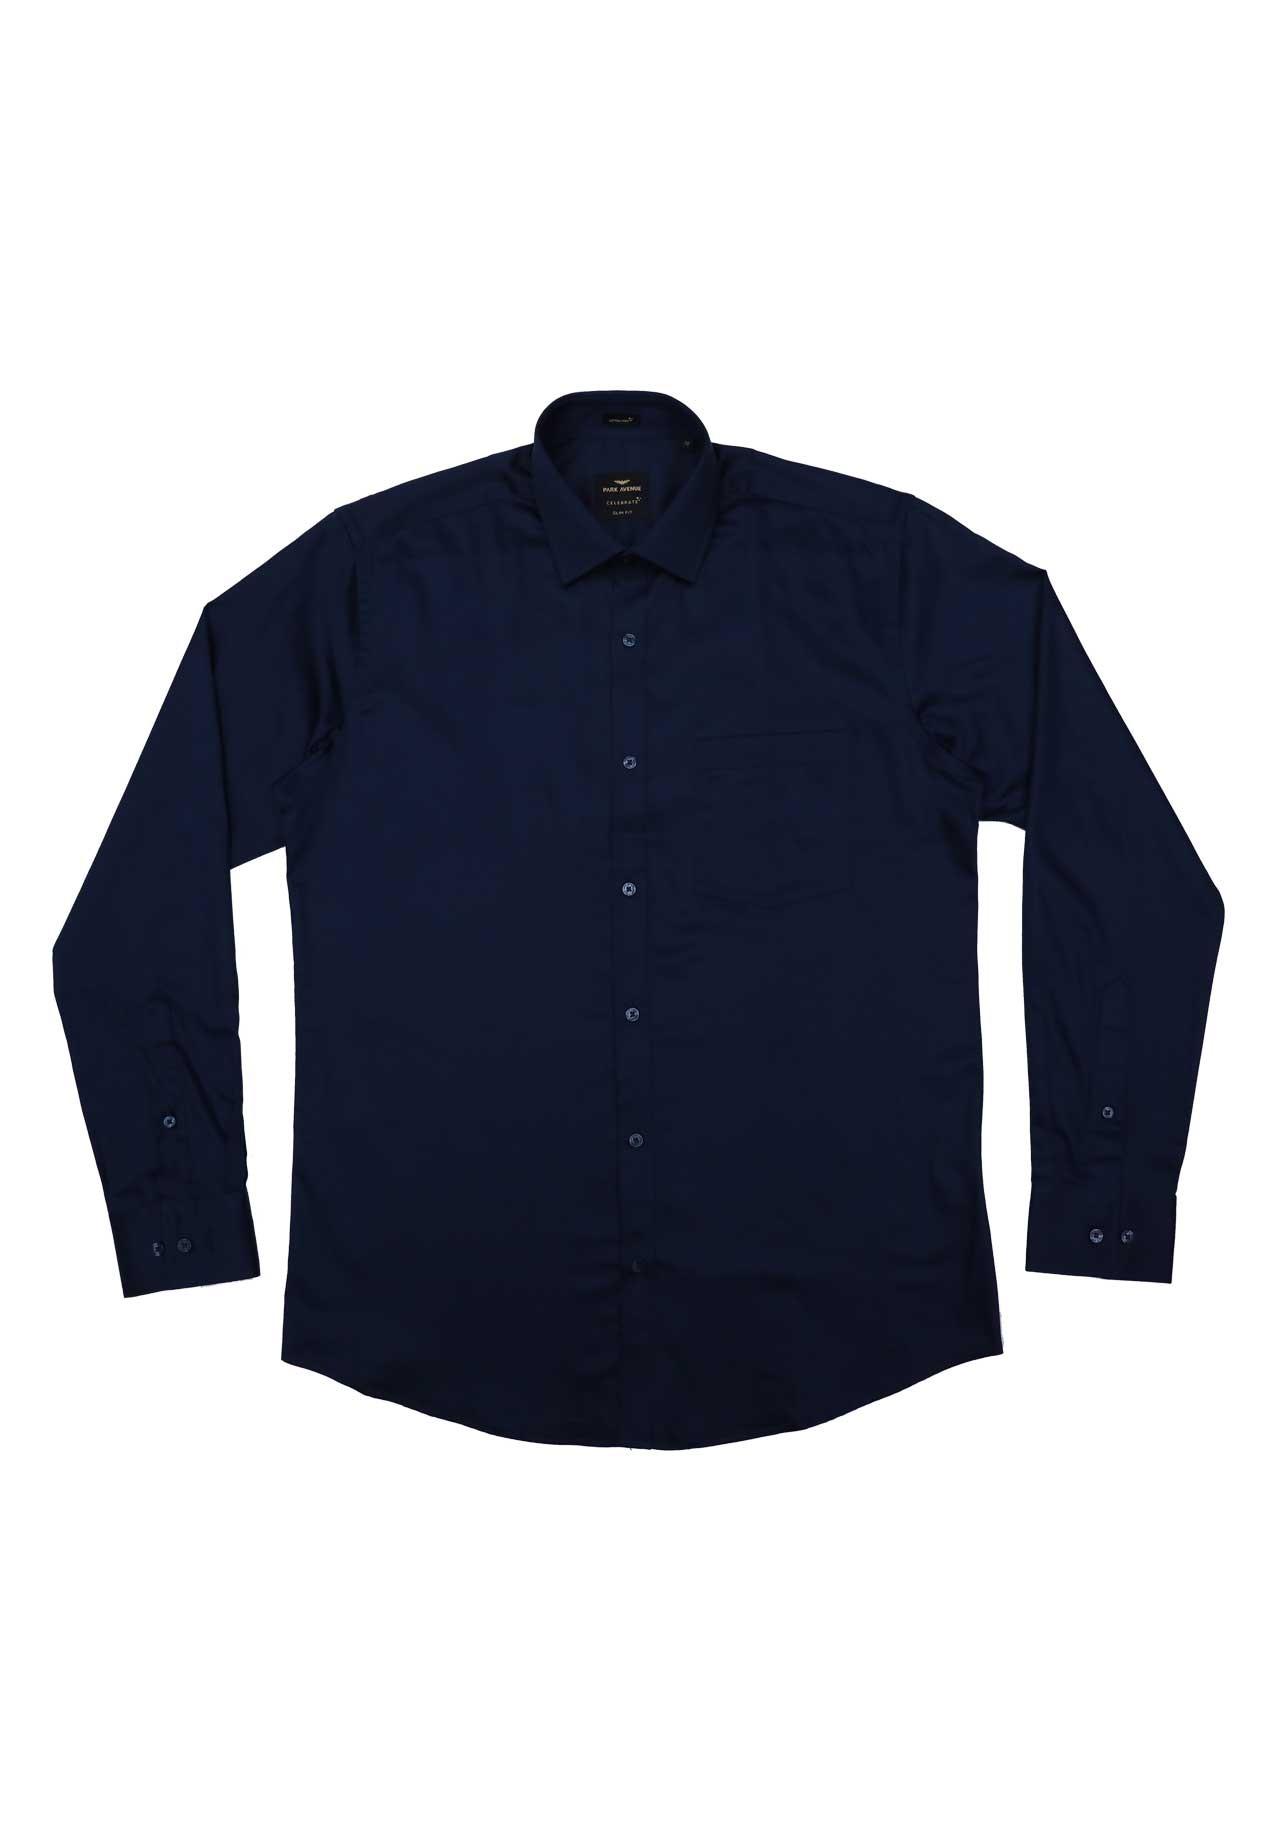 Park Avenue PISY00002-B8 Mens Shirt, Size 42